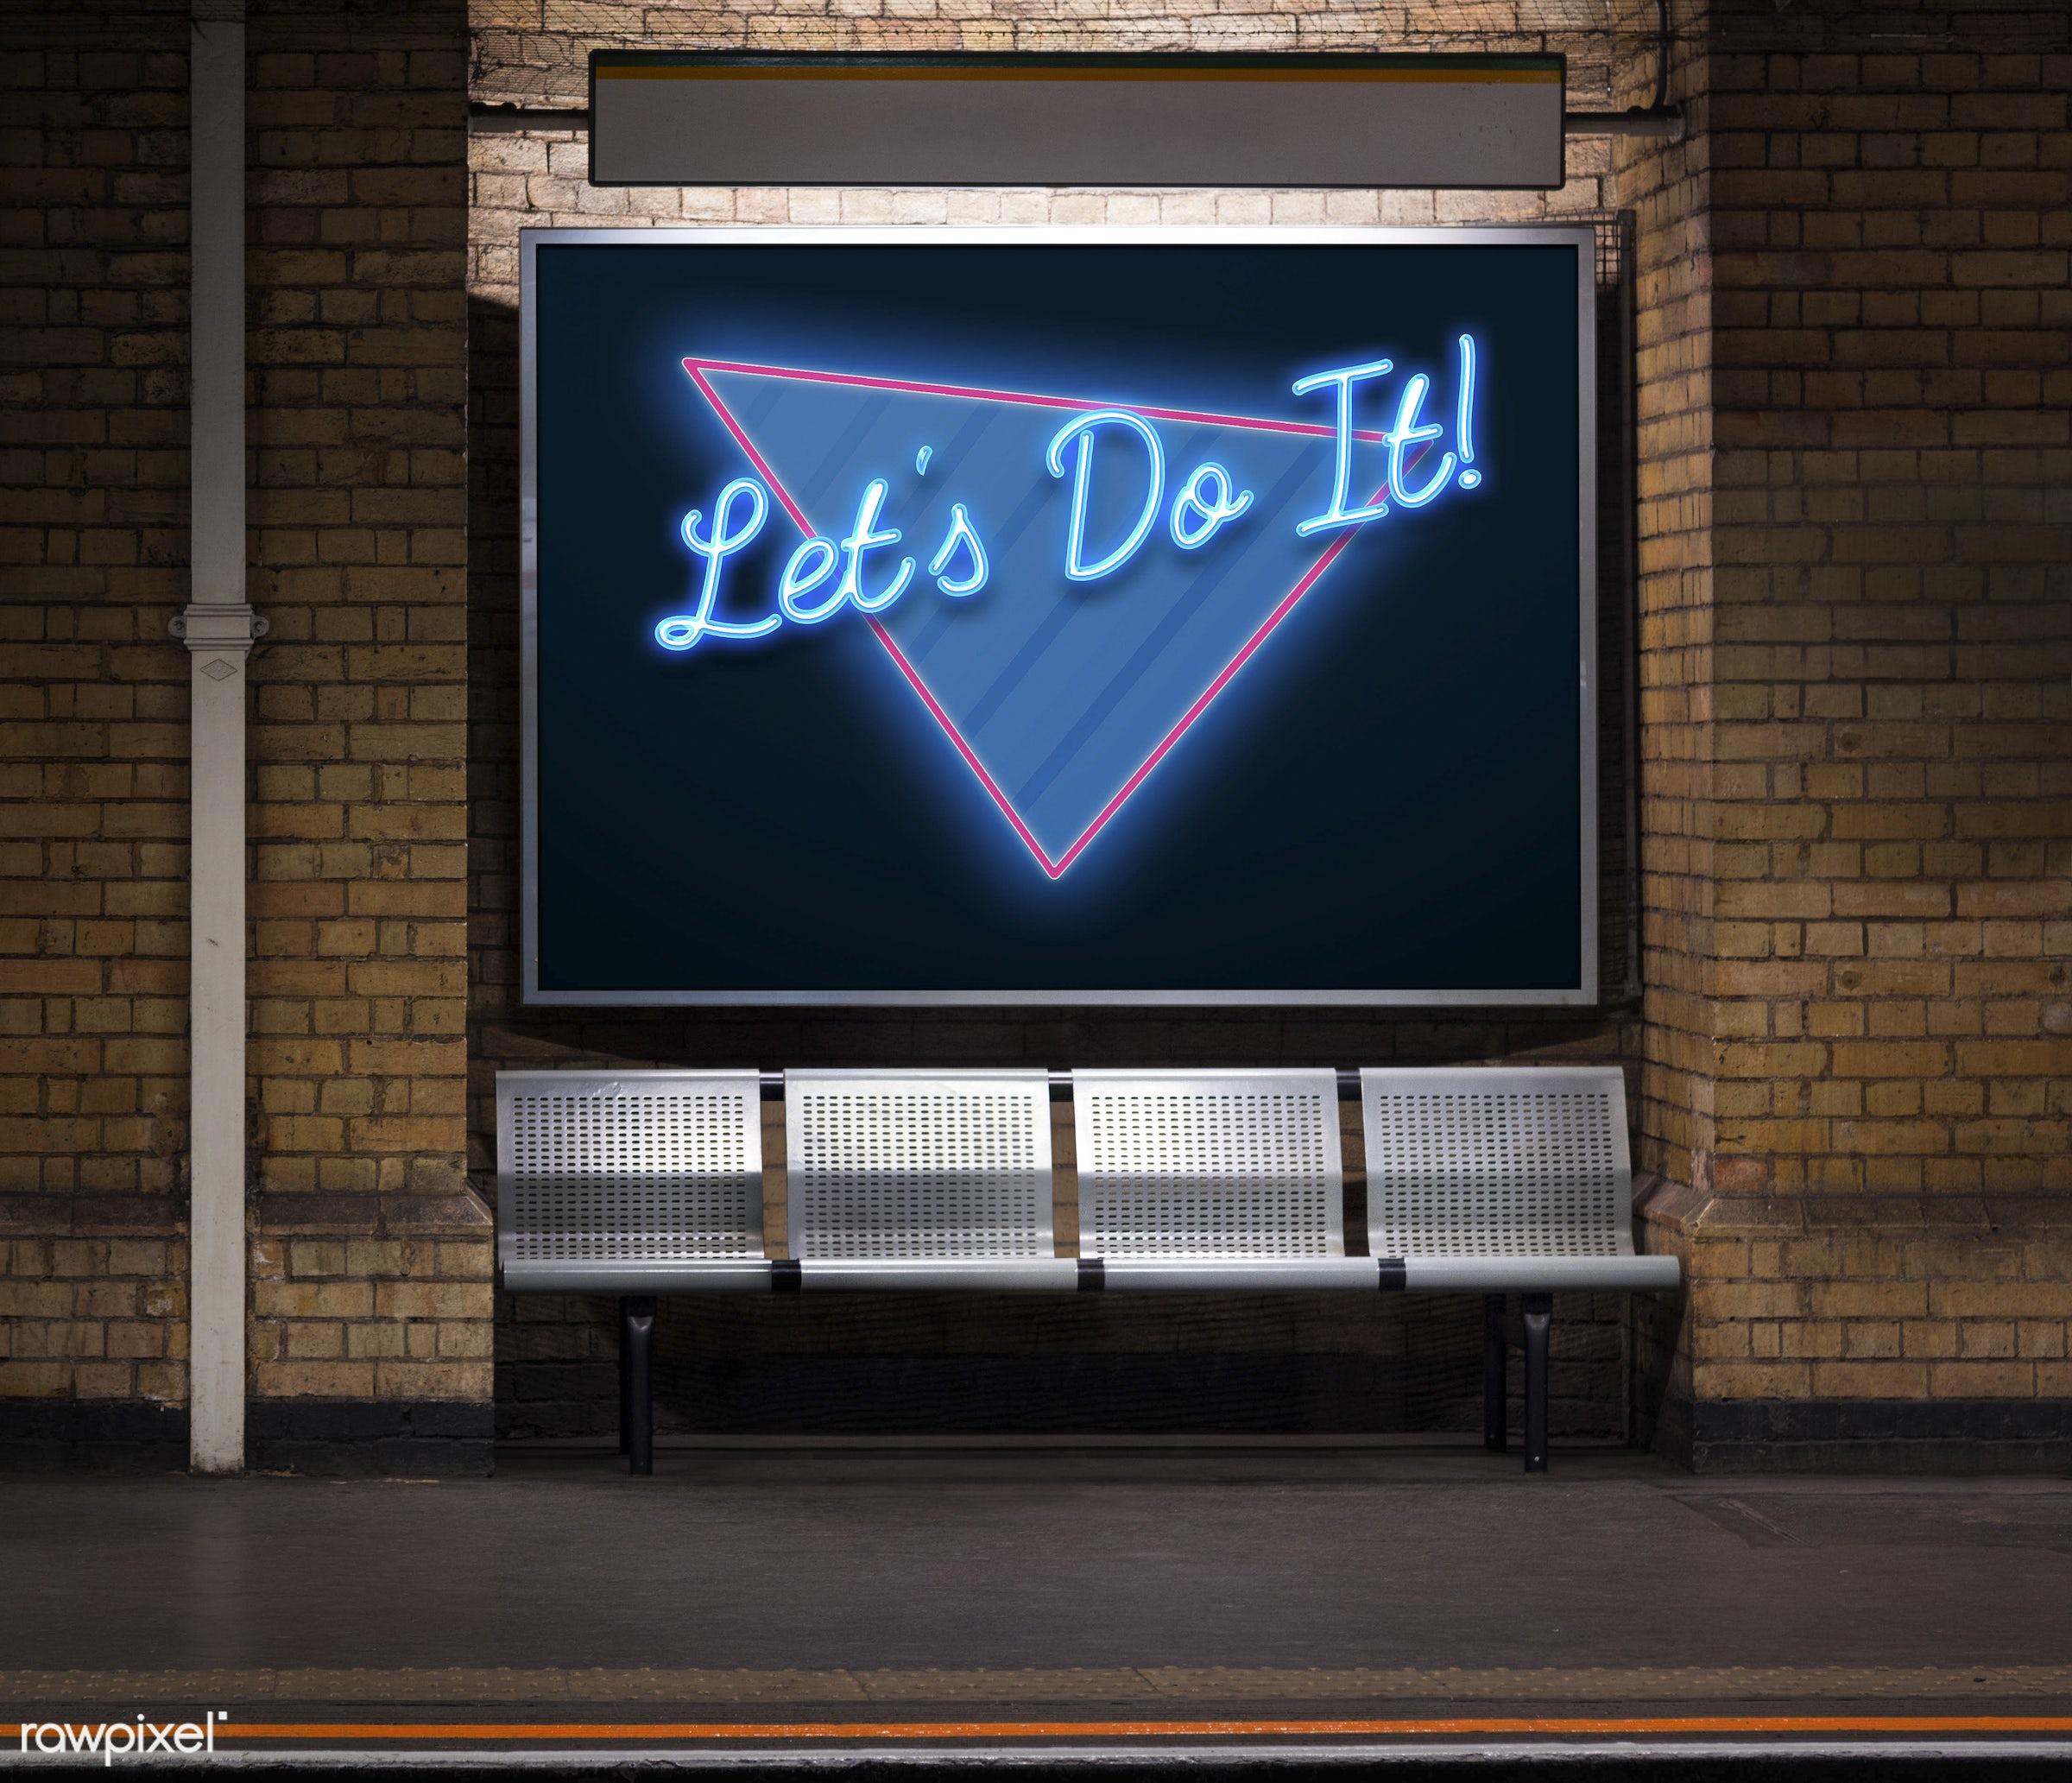 aspiration, bricks, brickswall, effect, graphic, handwriting, let's do it, make it happen, motivation, new ways, nobody,...